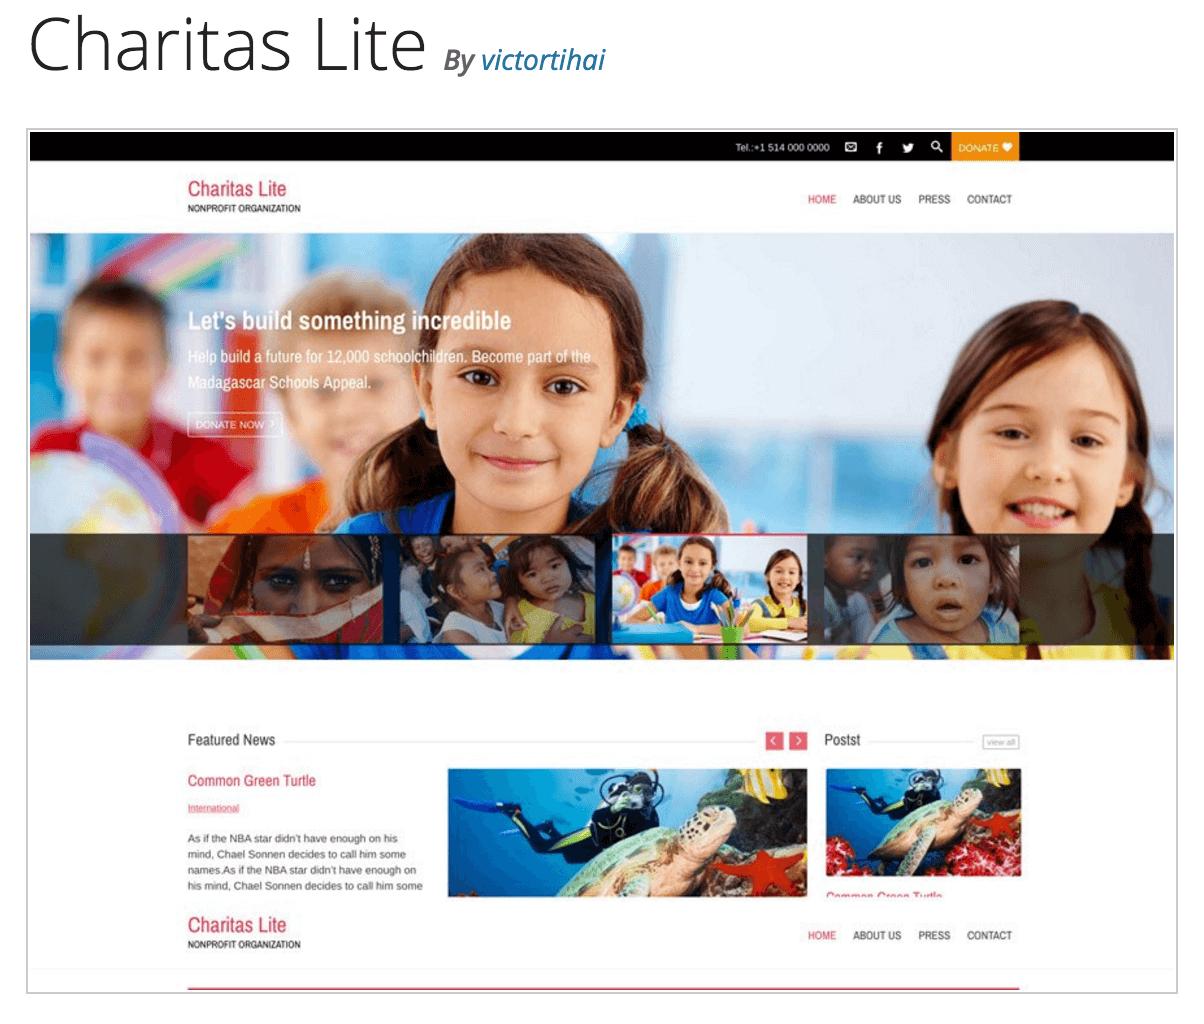 The Charitas Lite theme